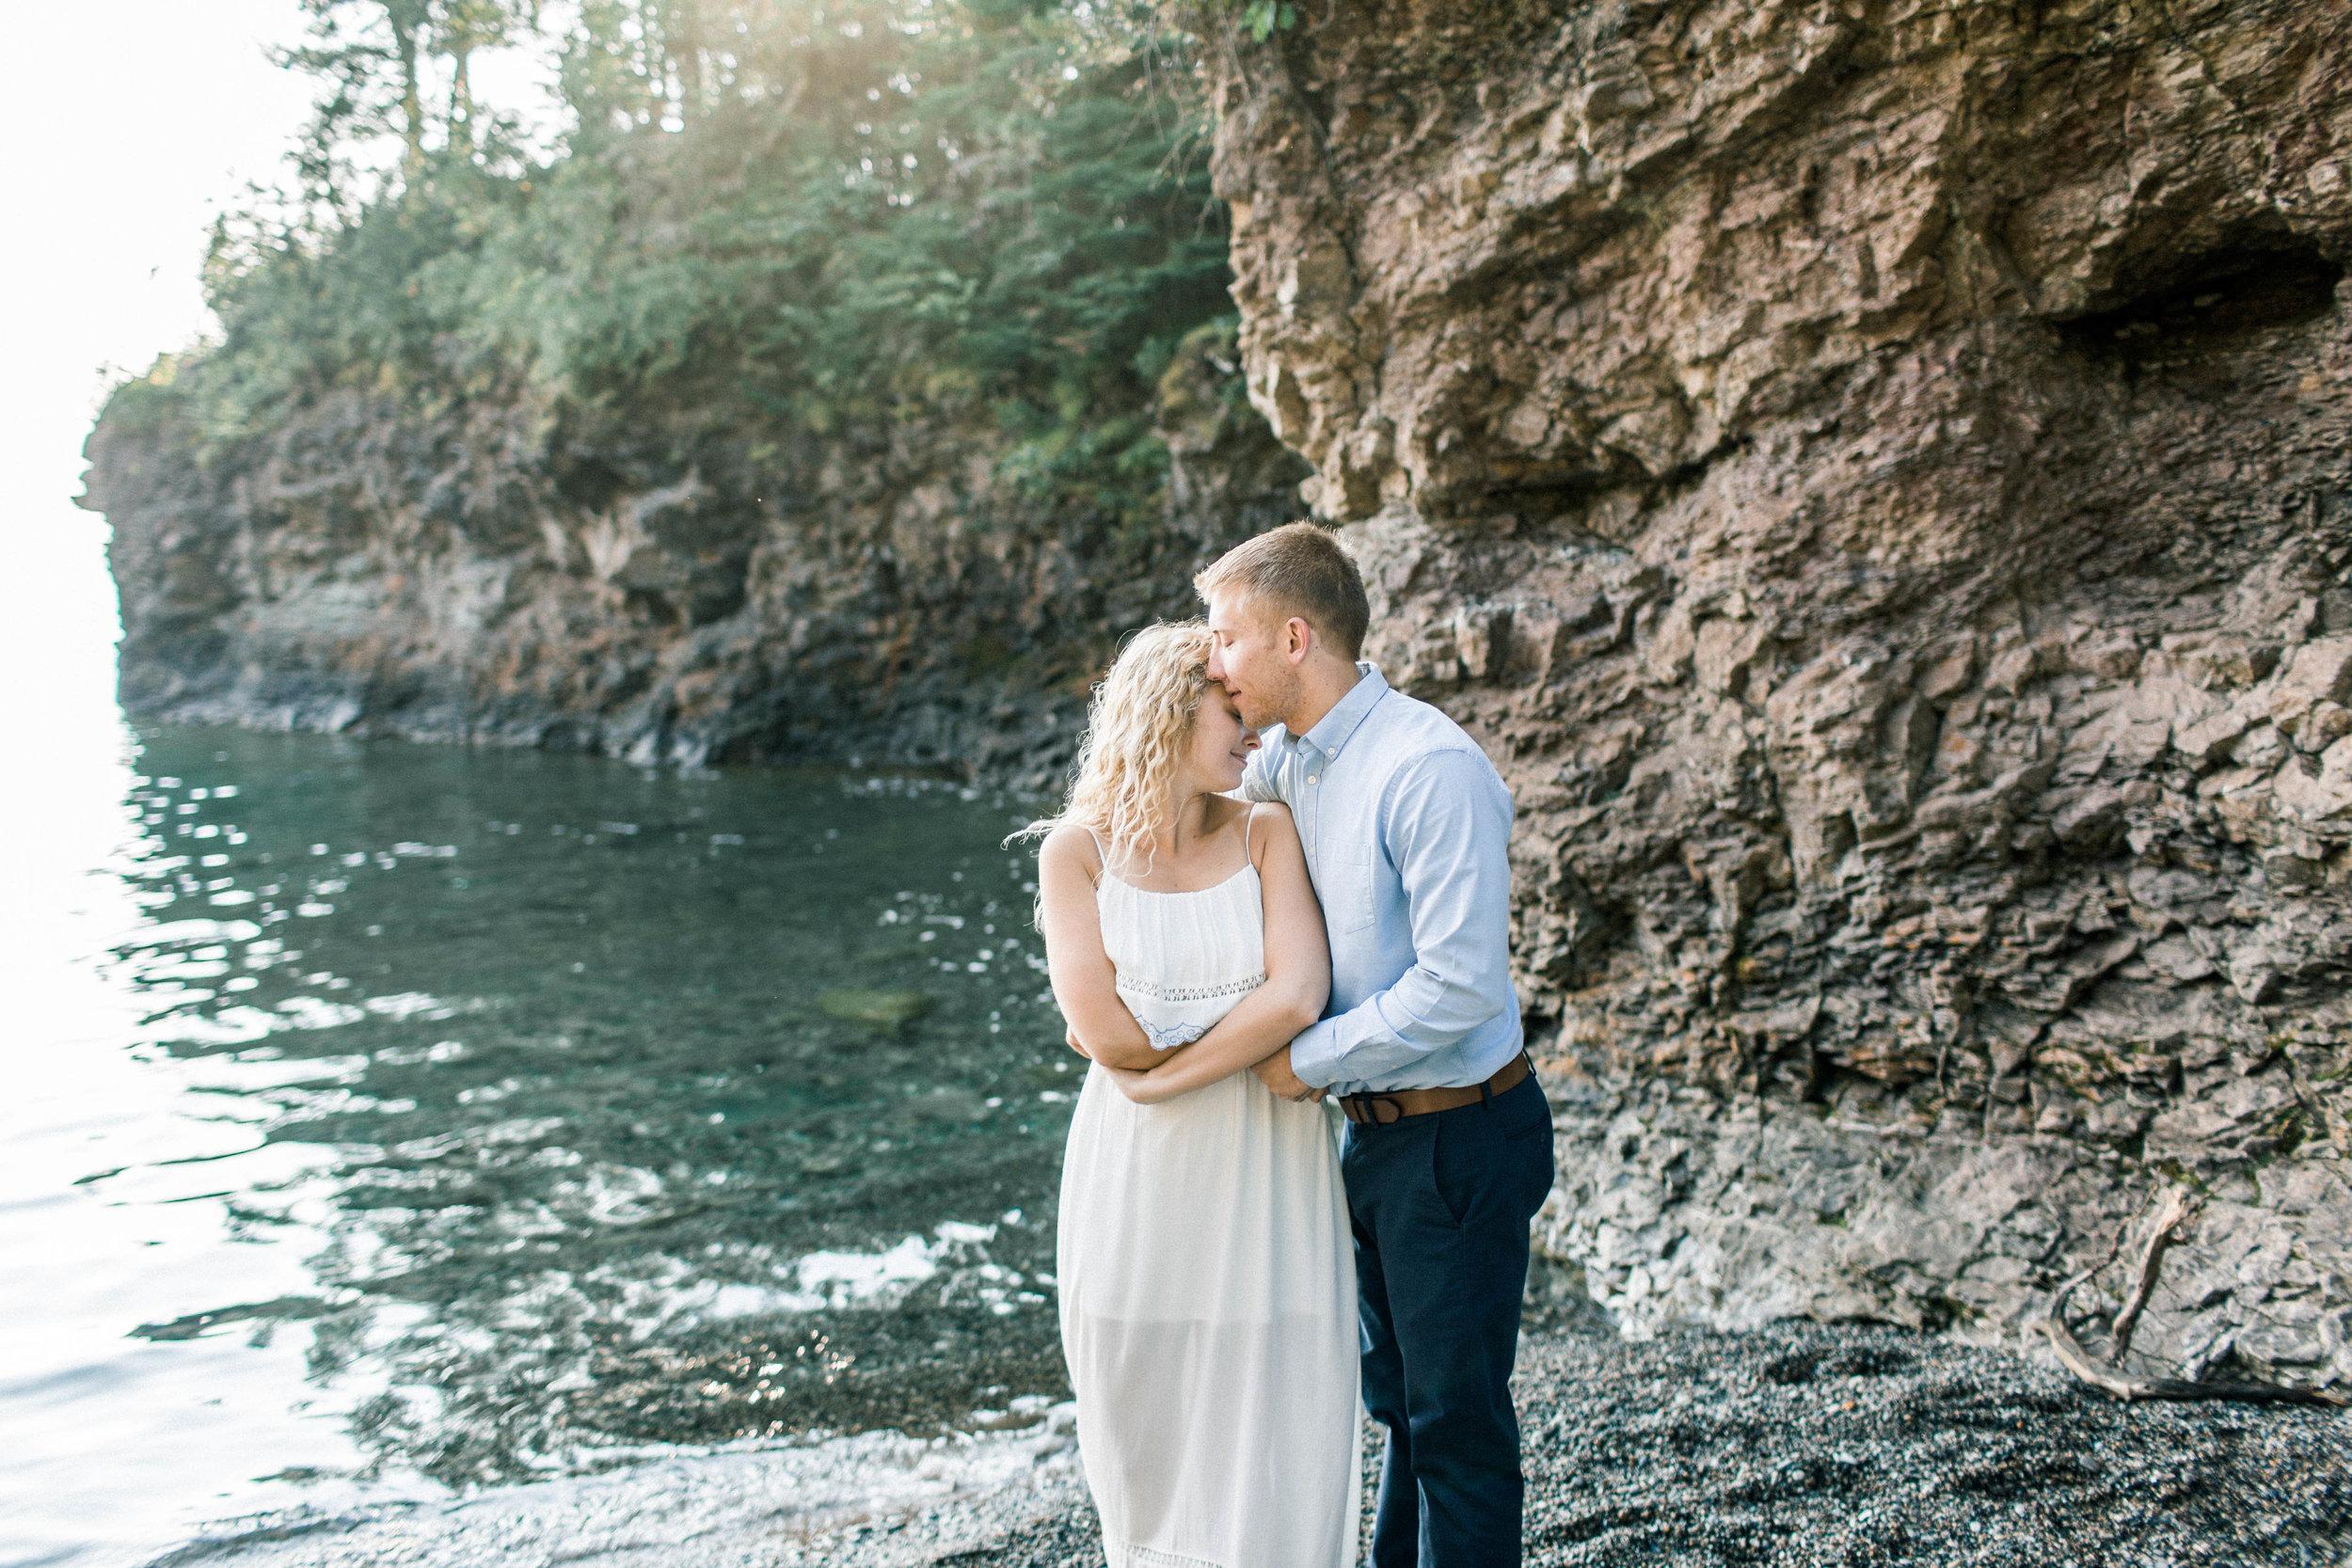 Northern Michigan Engagement Photographer - Lauren and Brent 043.jpg